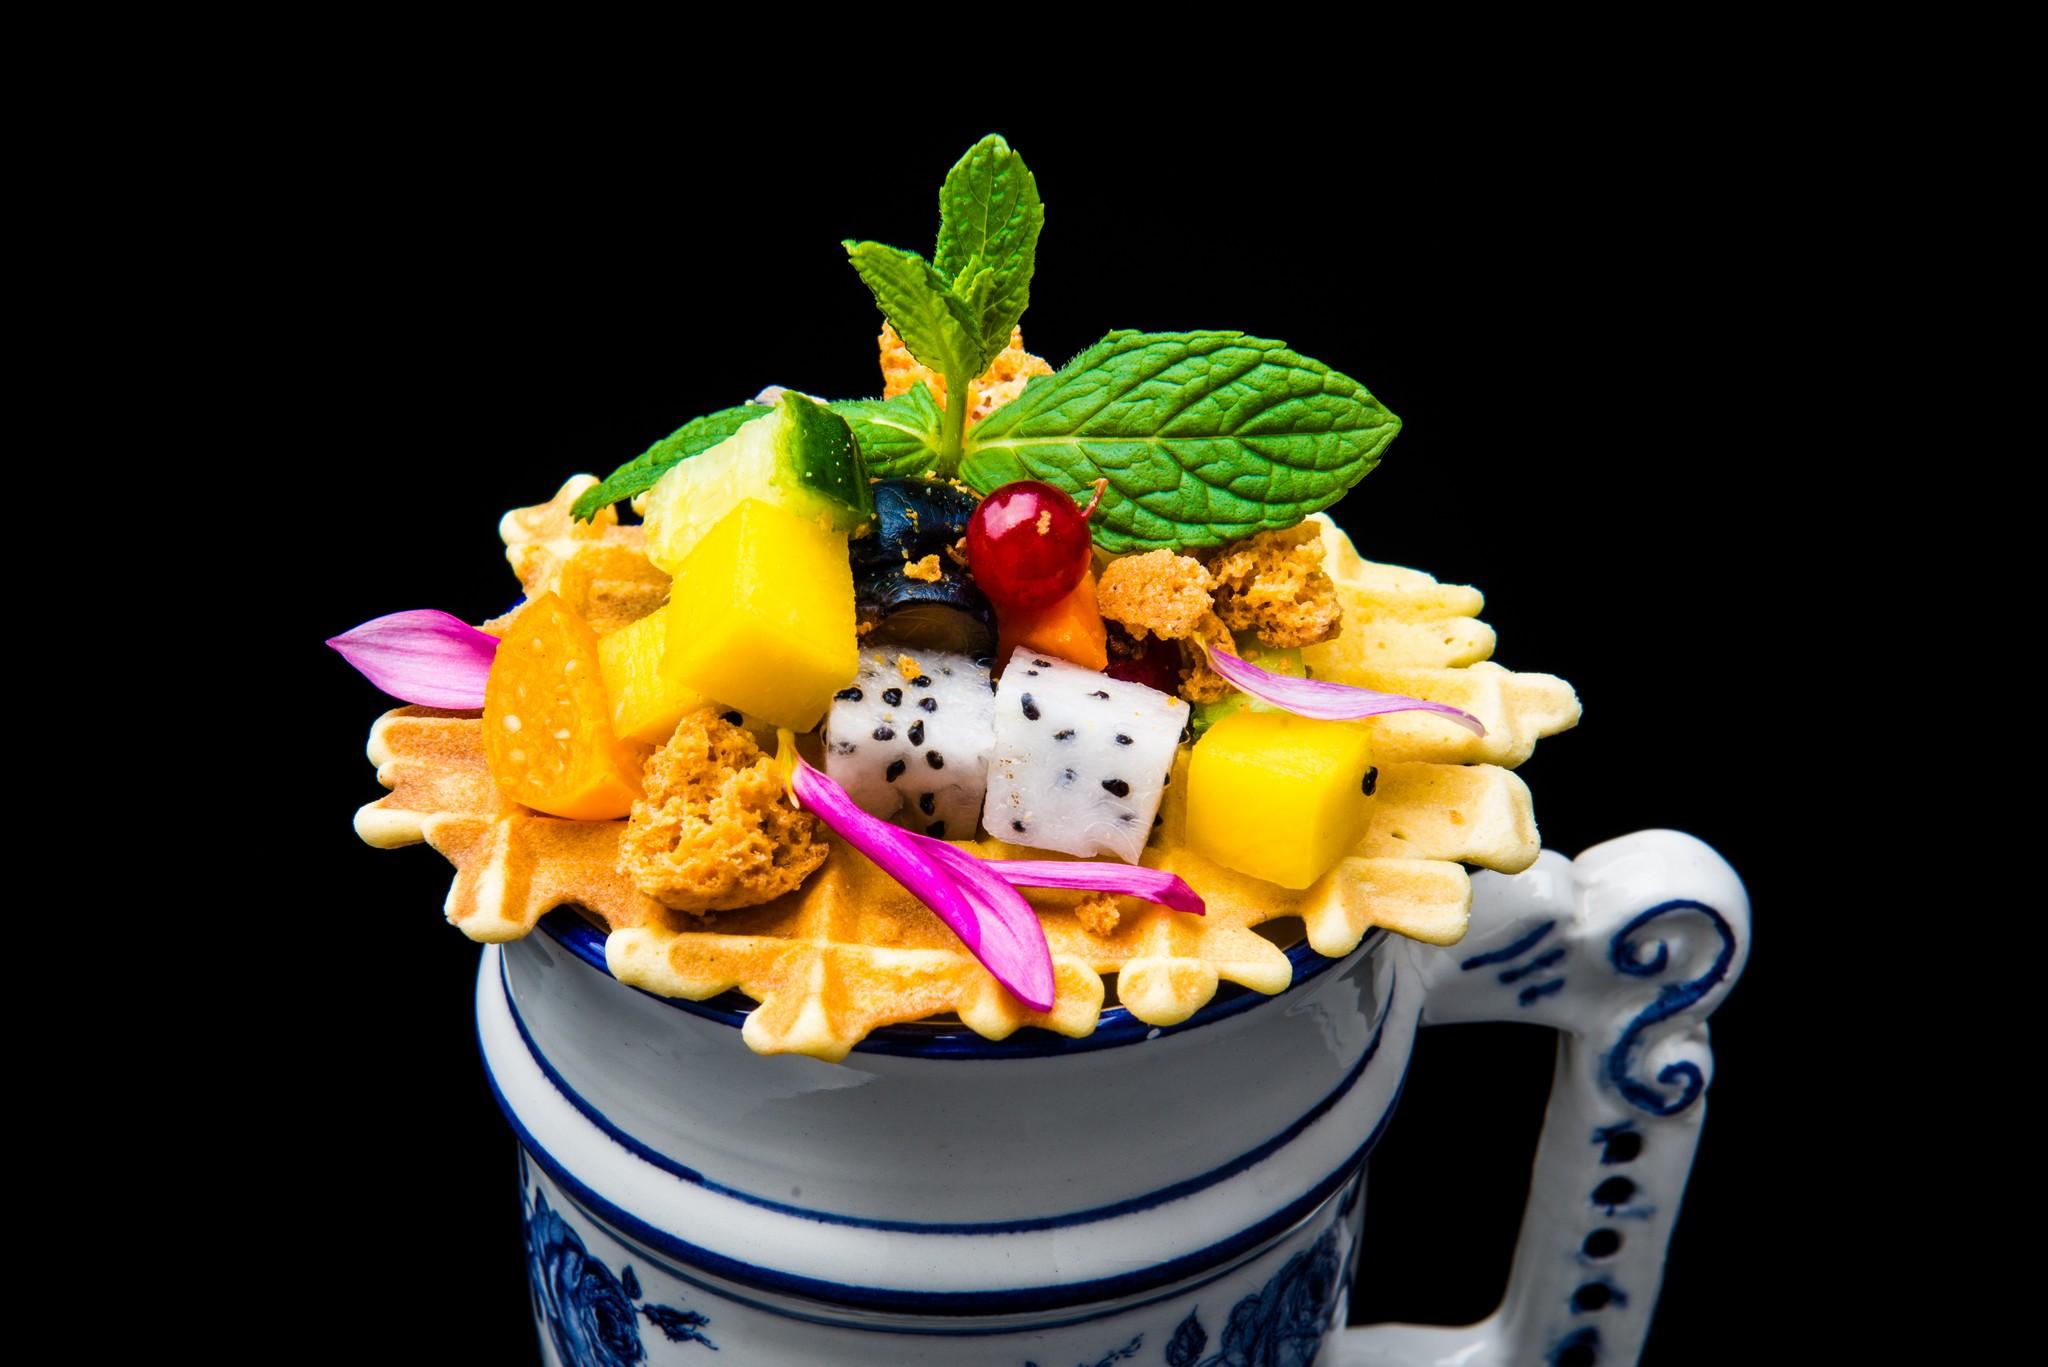 Flavia_Fiengo_Food_E_Beverage_00044